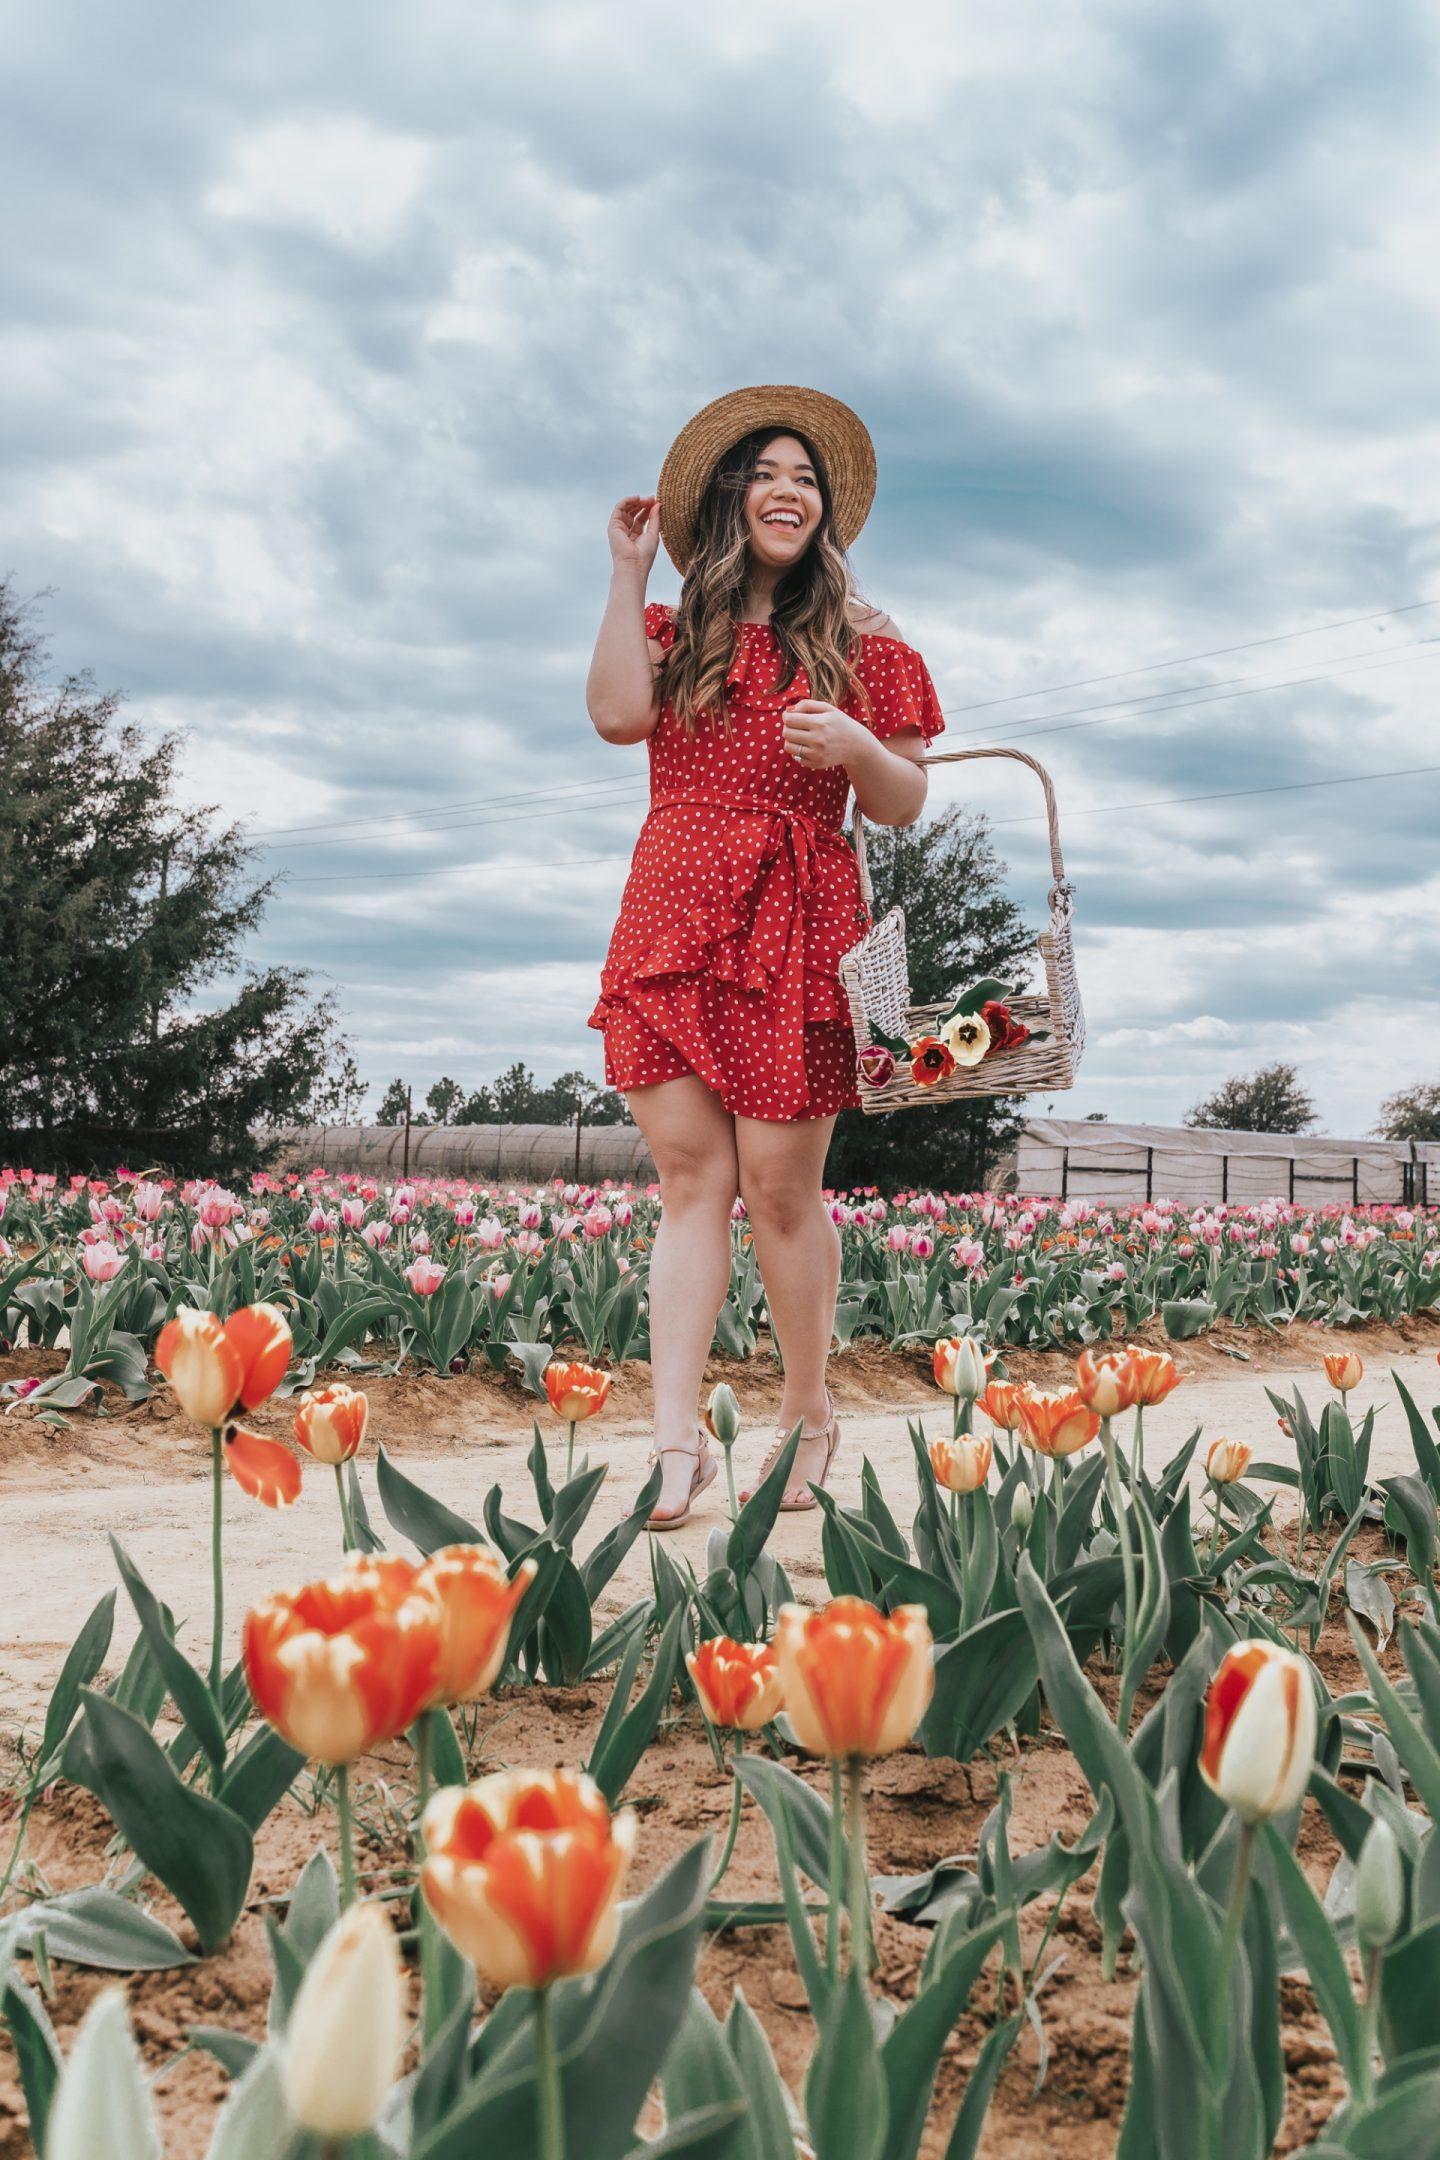 Red Polka Dot Wrap Dress for Texas Tulips